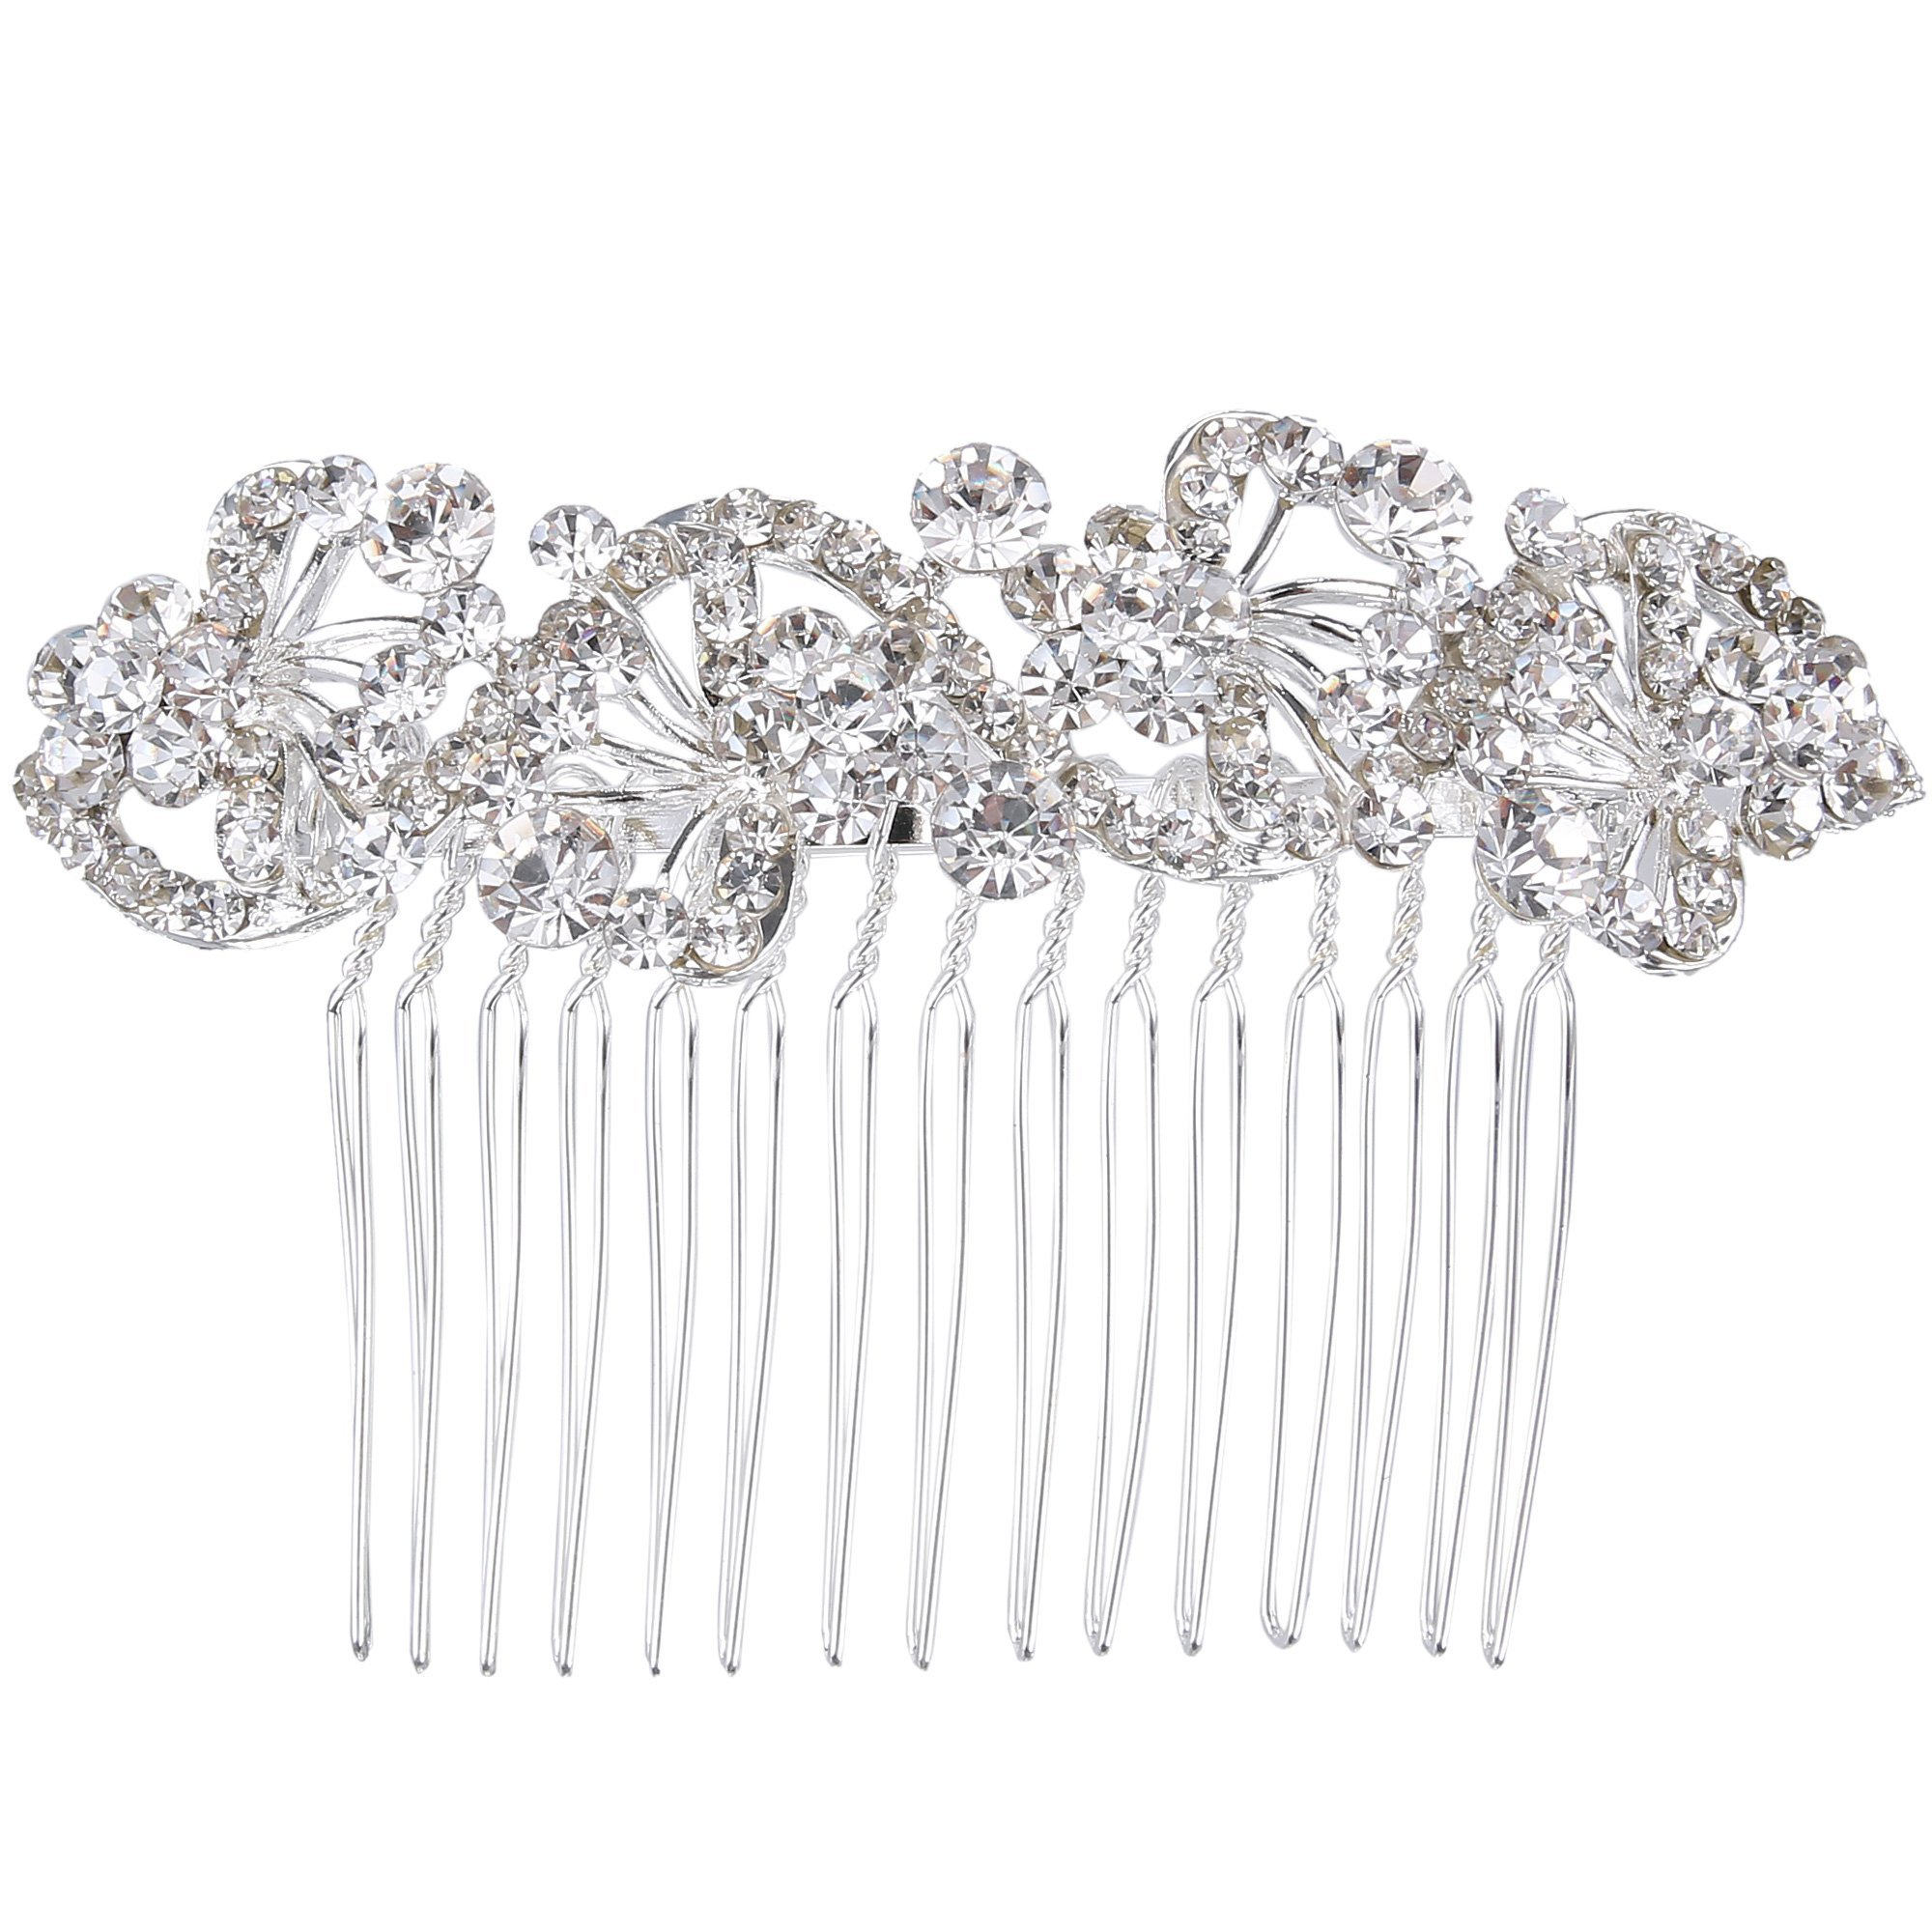 BriLove Wedding Hair Accessories Wedding Hair Comb Bohemian Crystal Charming Wave Shape Flower Bride Side Comb Women Silver-Tone Clear